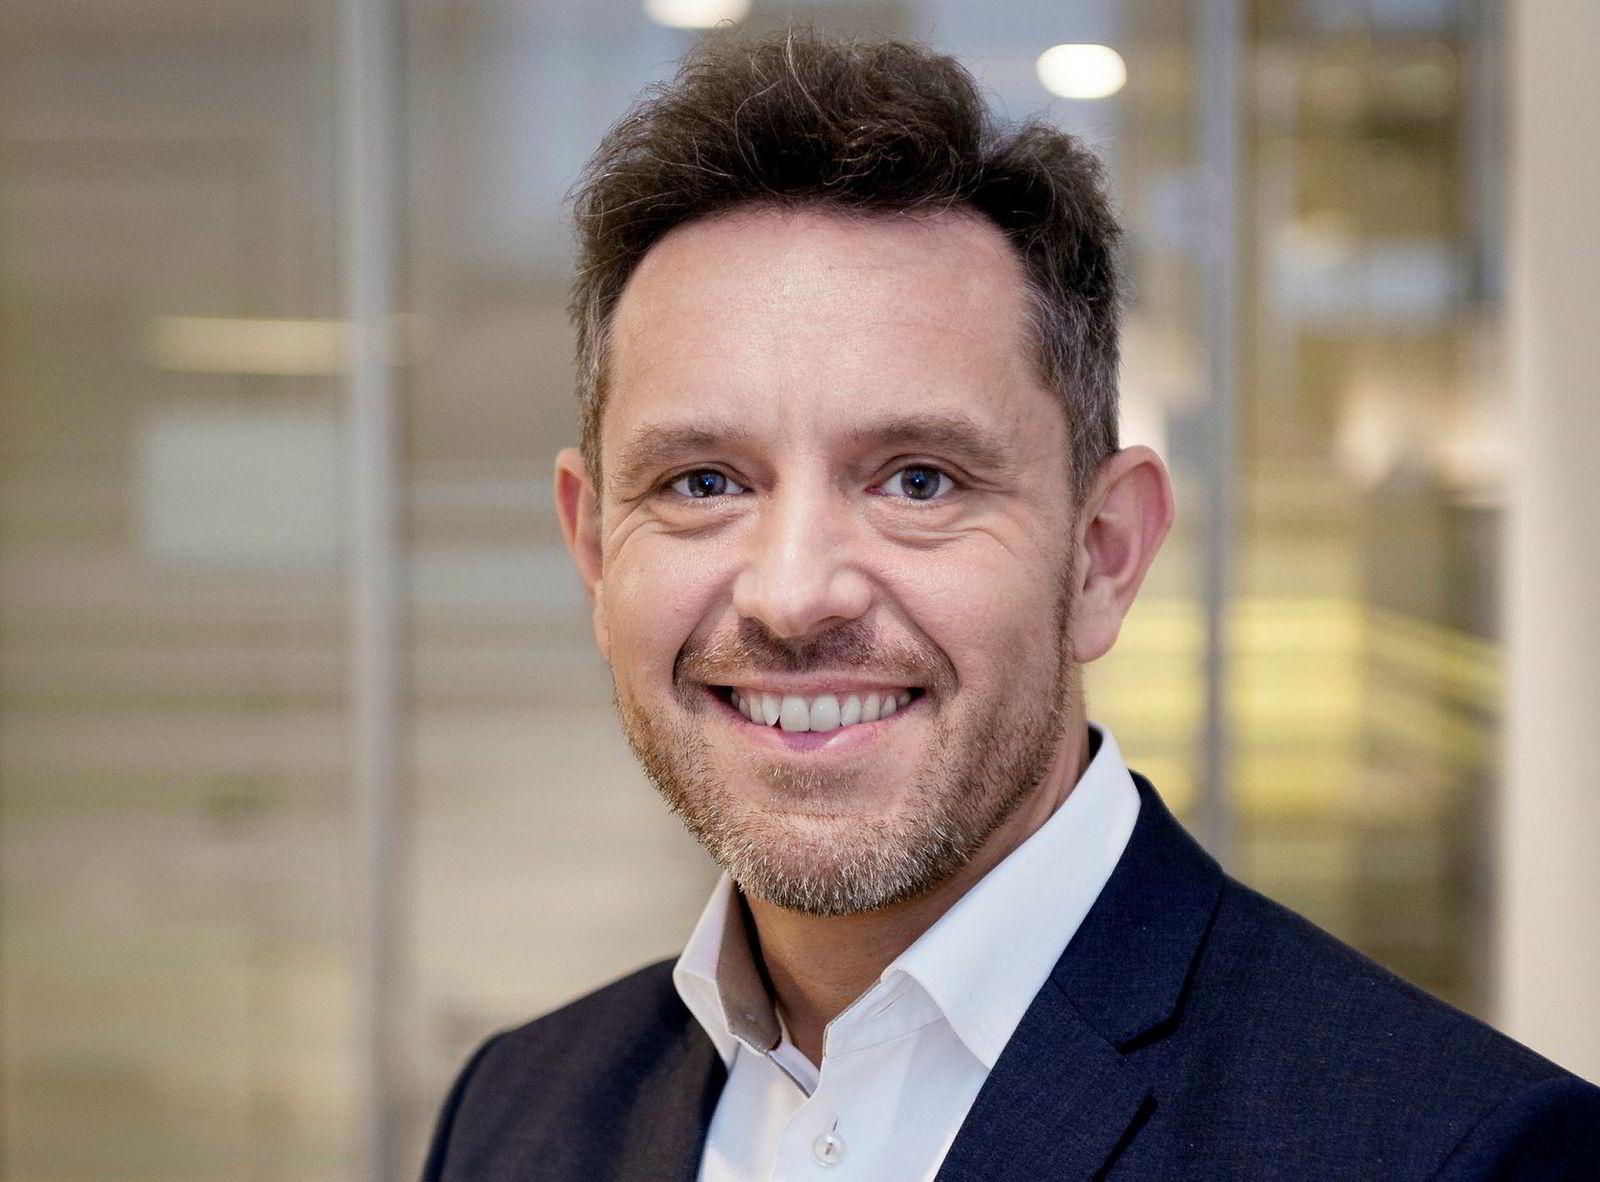 Bjørn-Inge Haugan, kommunikasjonssjef i Sparebank 1 Østlandet